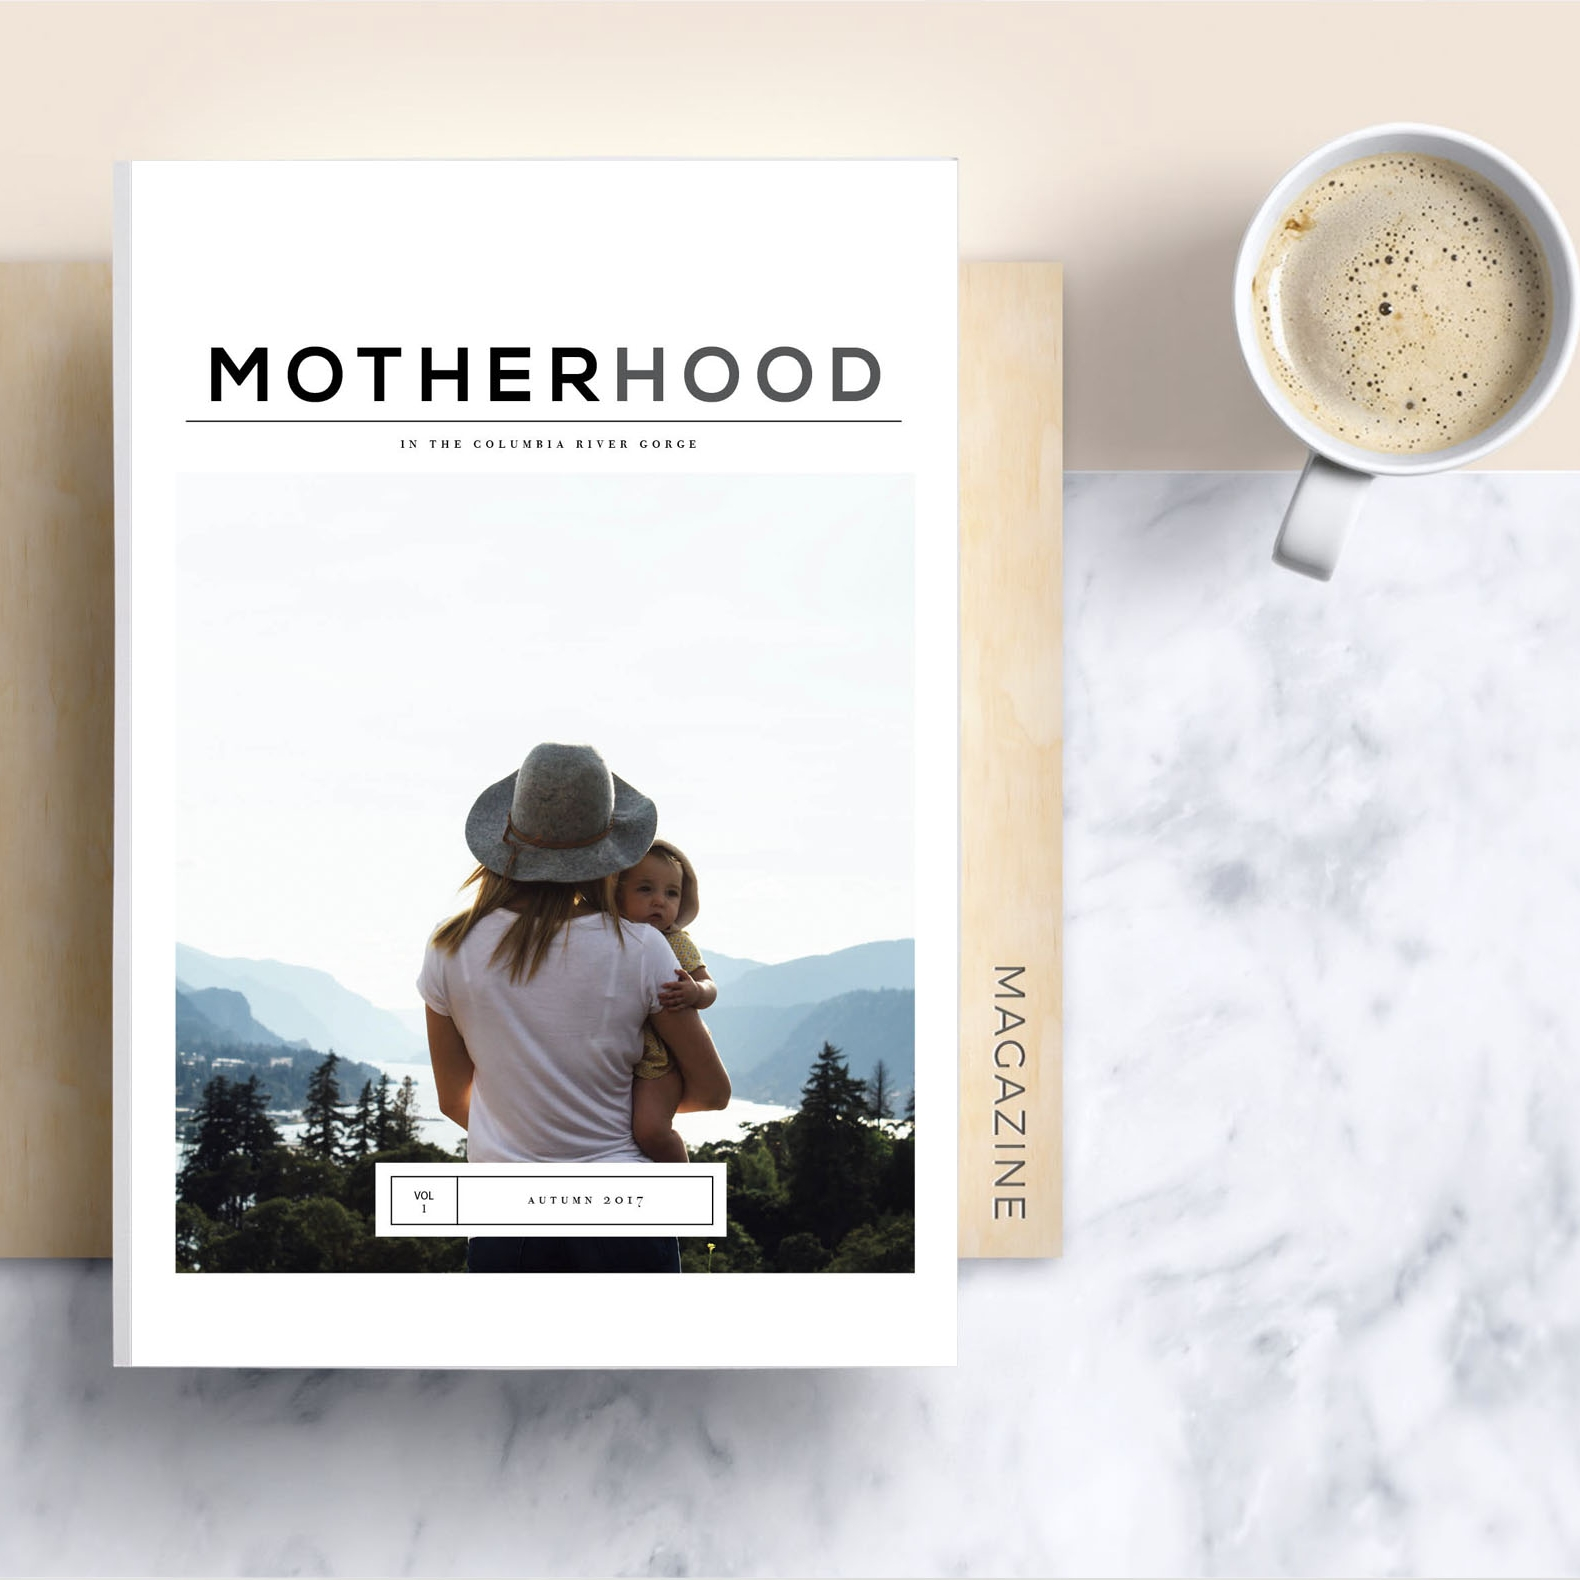 motherhoodinthegorgecover.jpg